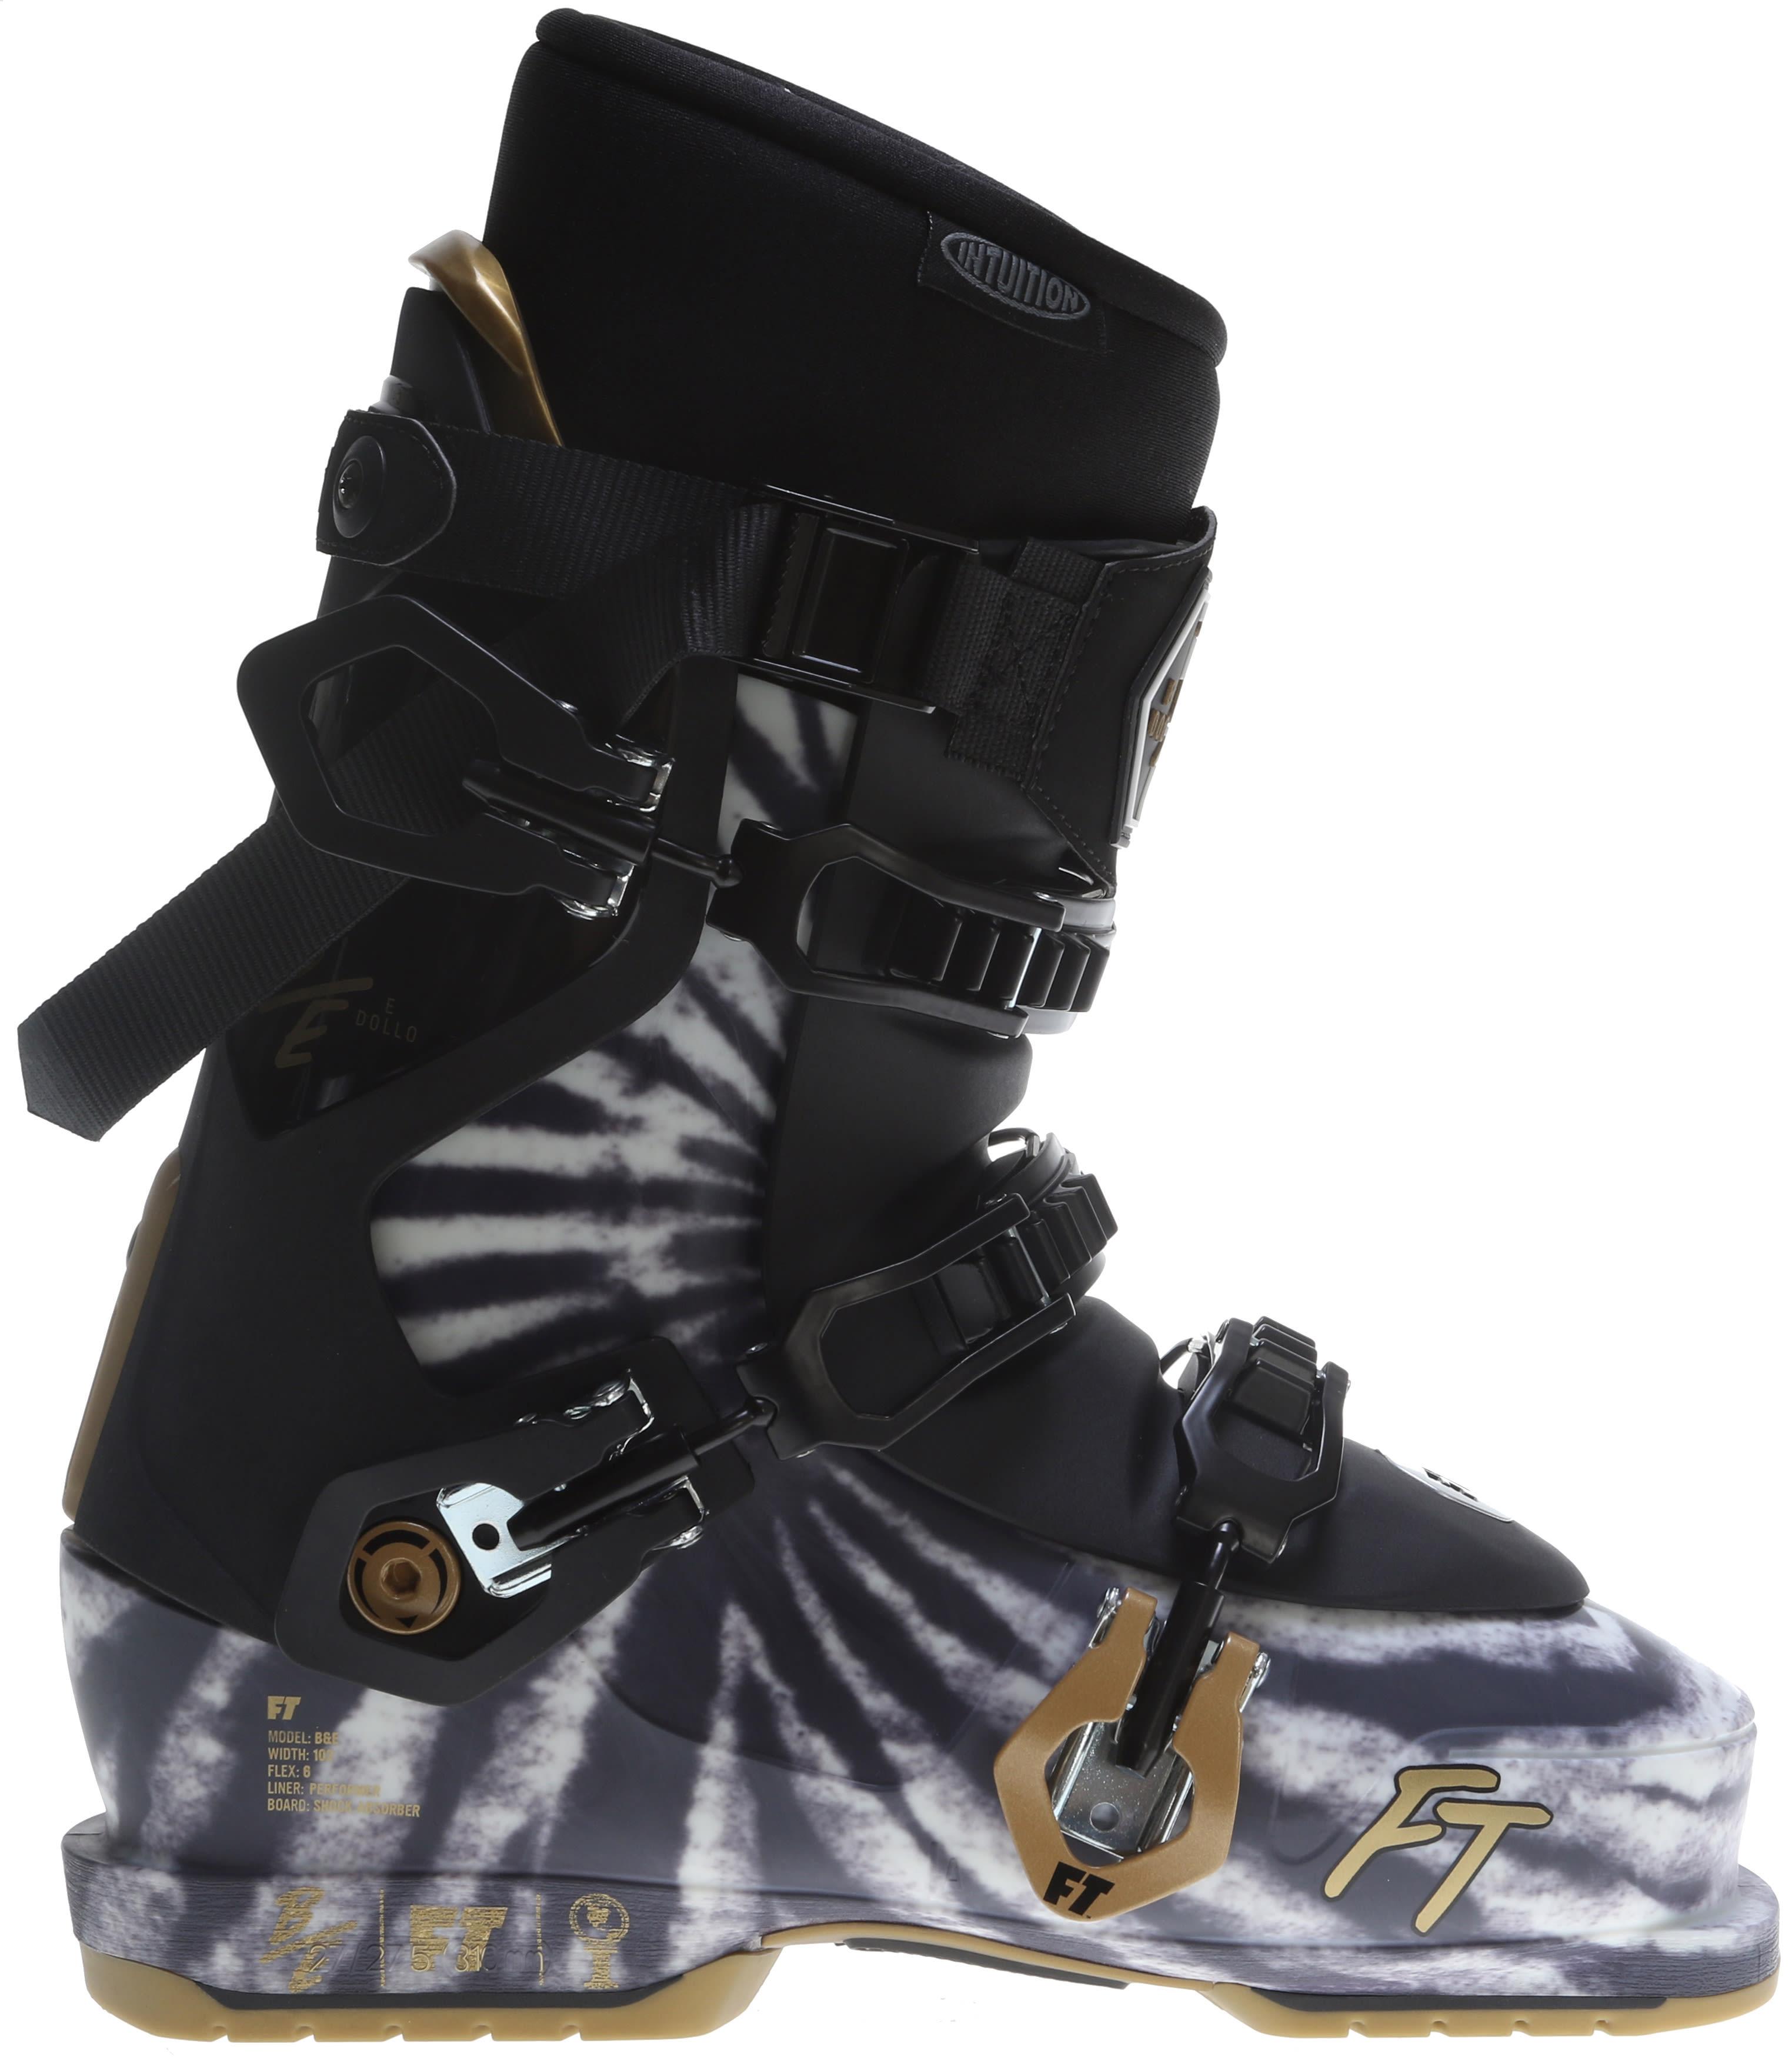 On Sale Full Tilt Ski Boots - Downhill, Alpine Ski Boots